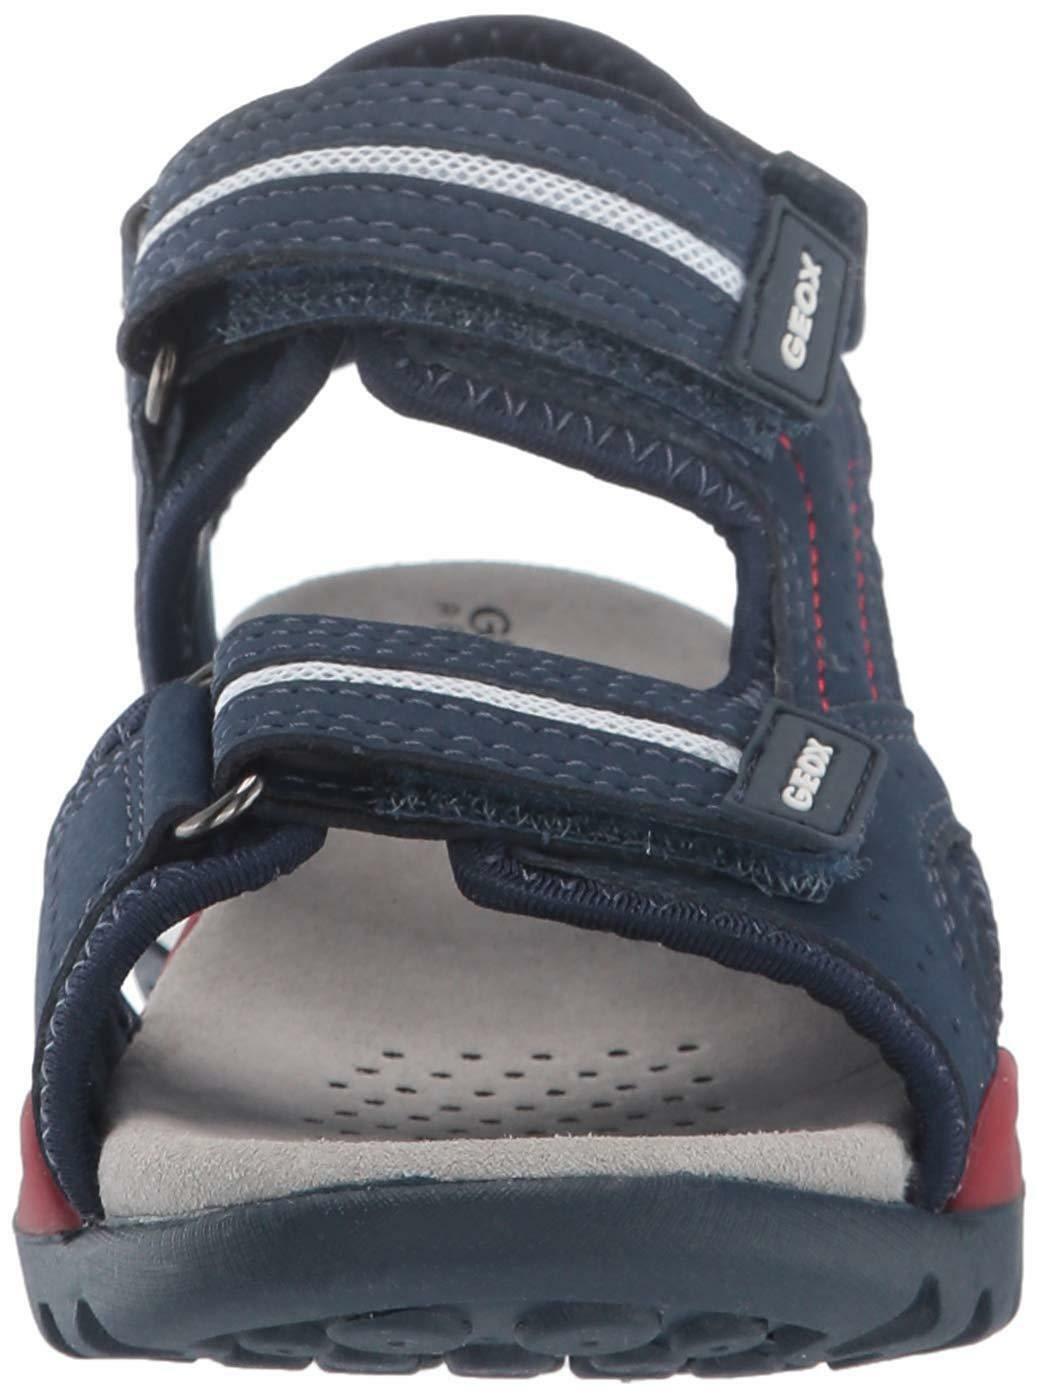 geox j borealis sandaletti bambino blu j920rdc0735